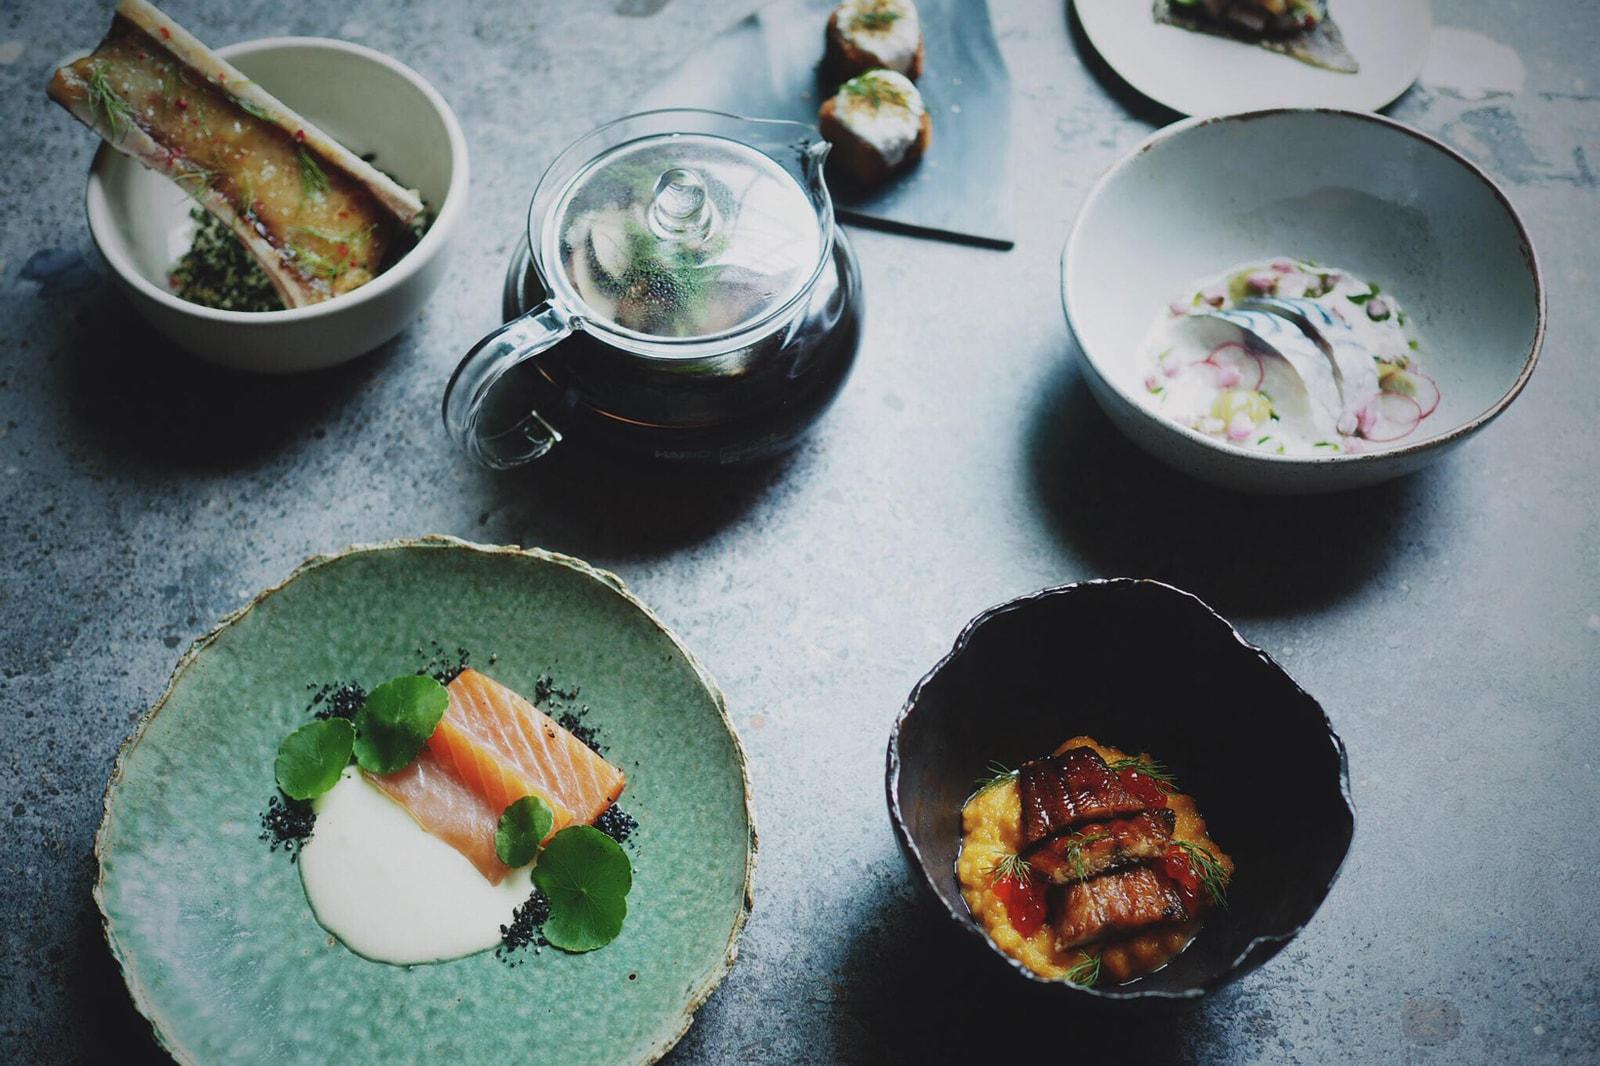 best restaurant recommendations brands retailers hypebeast amsterdam london los angeles chicago toronto manila london tokyo